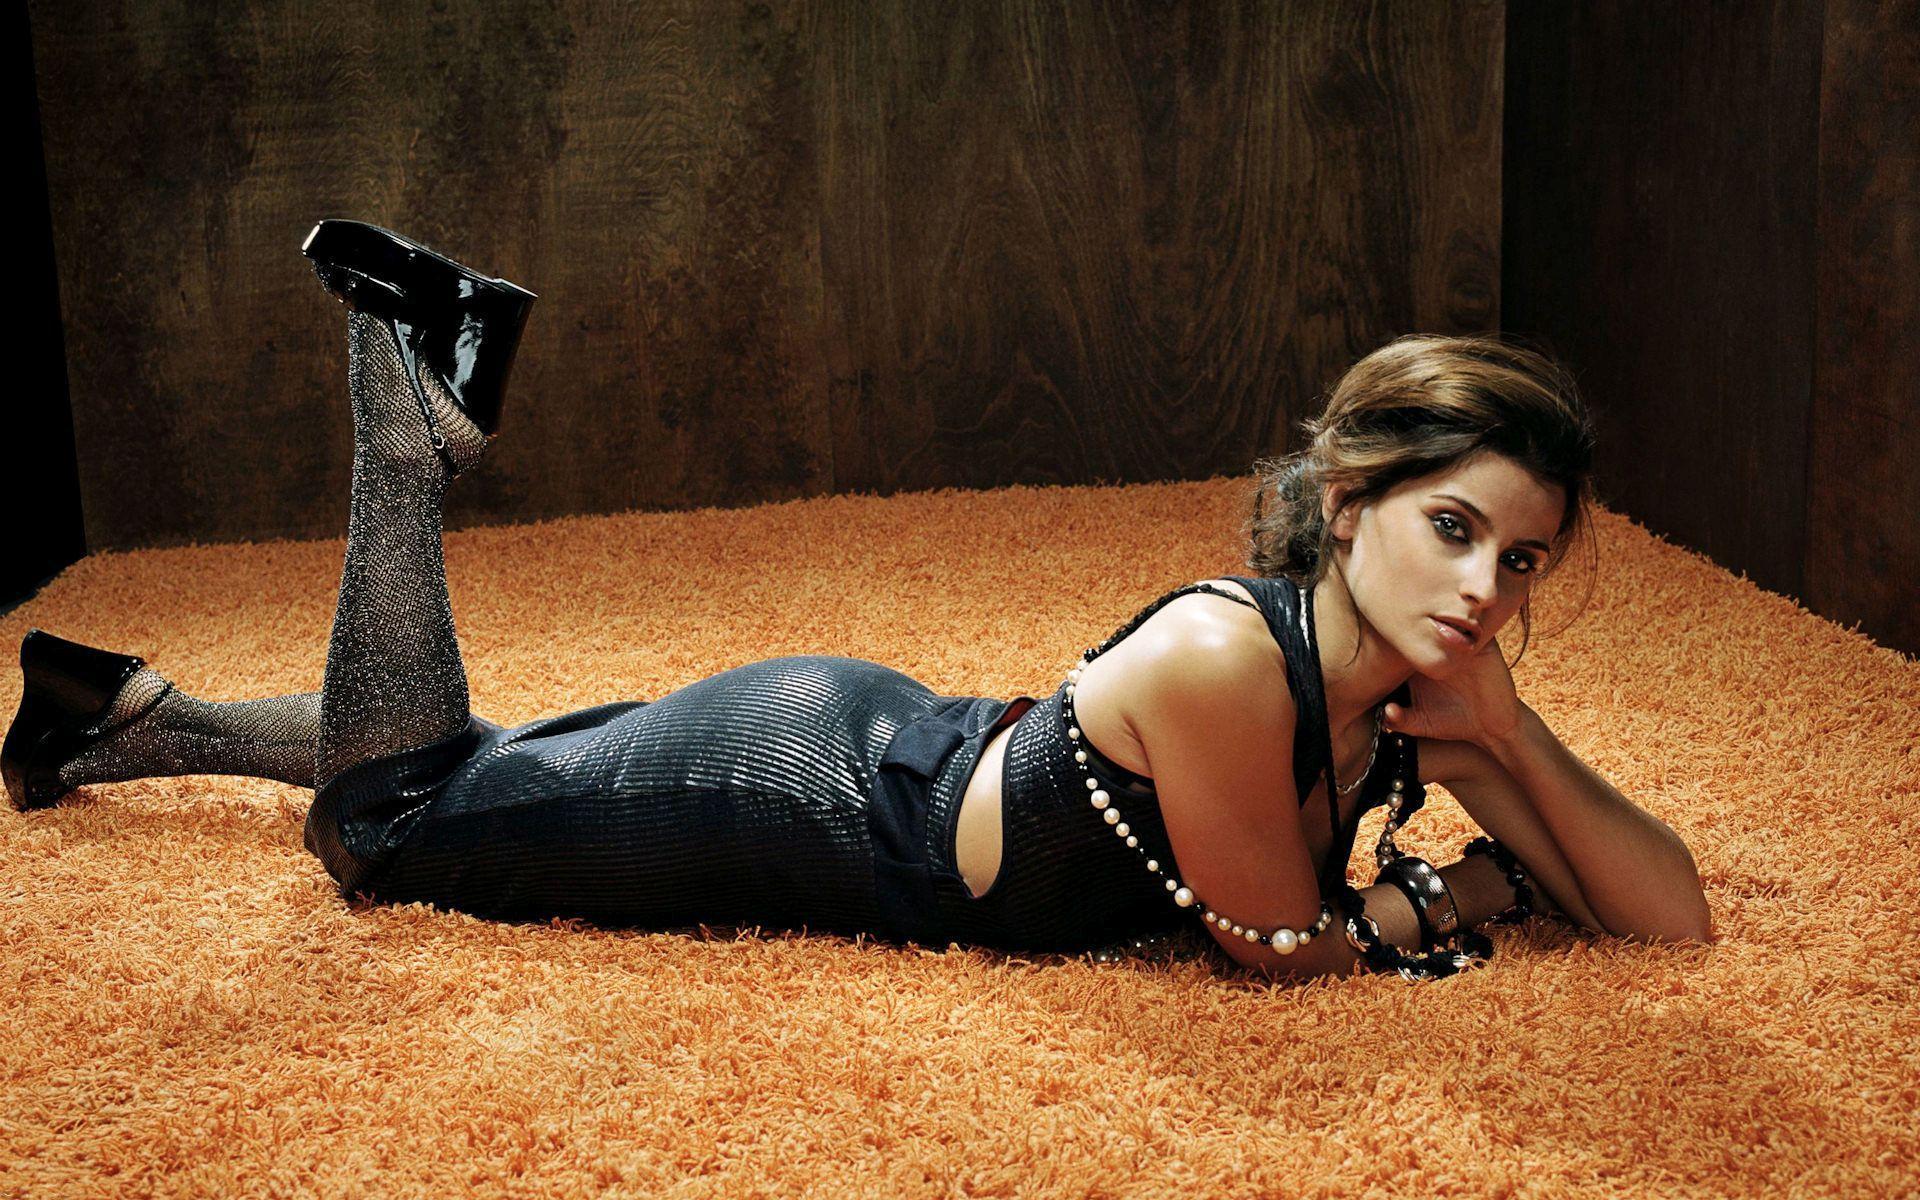 Good Night Hd Wallpaper 3d Love Hd Nelly Furtado In A Black Dress Wallpaper Download